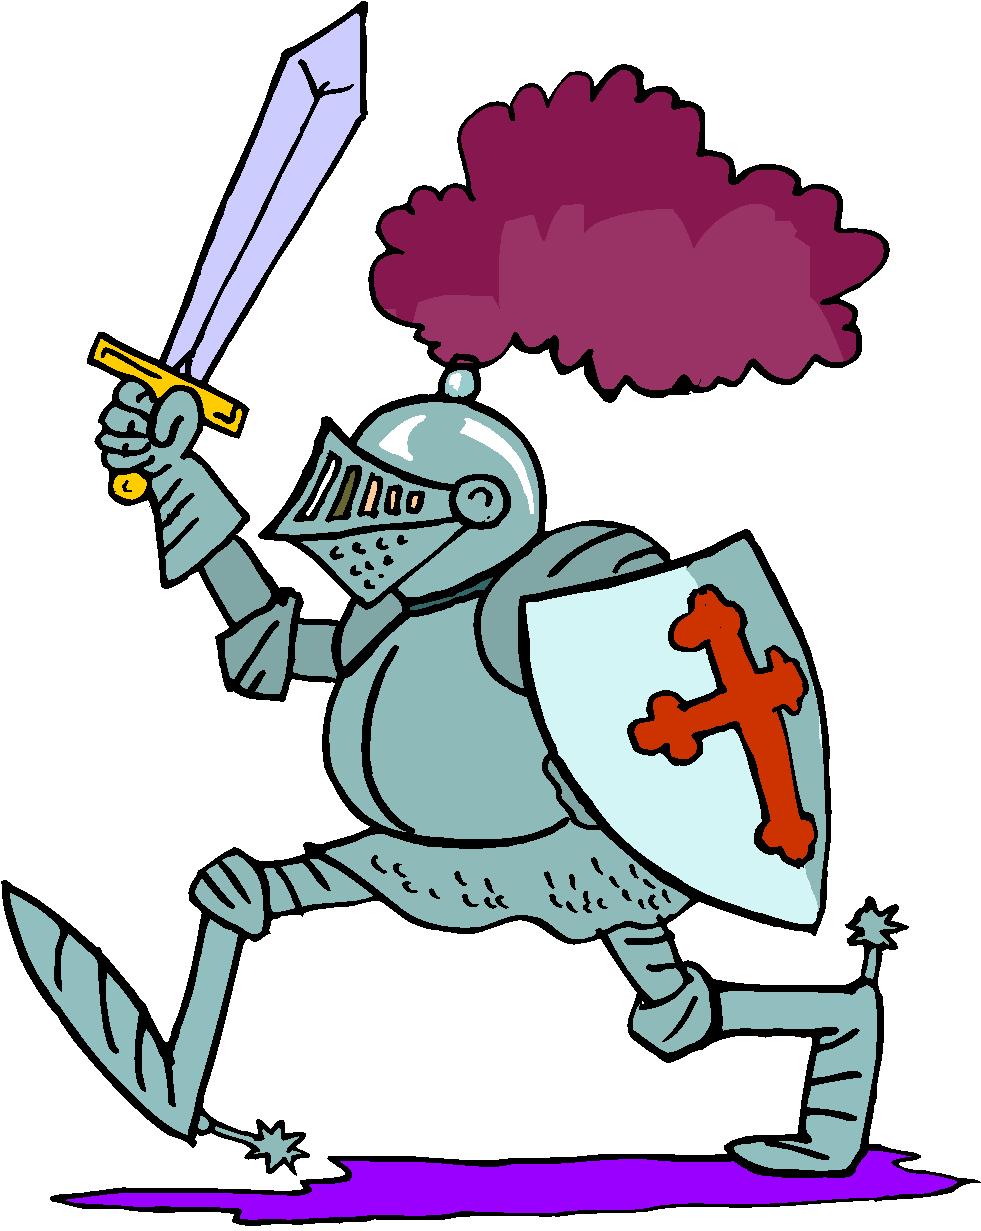 Clip art panda free. Medieval clipart knight armor